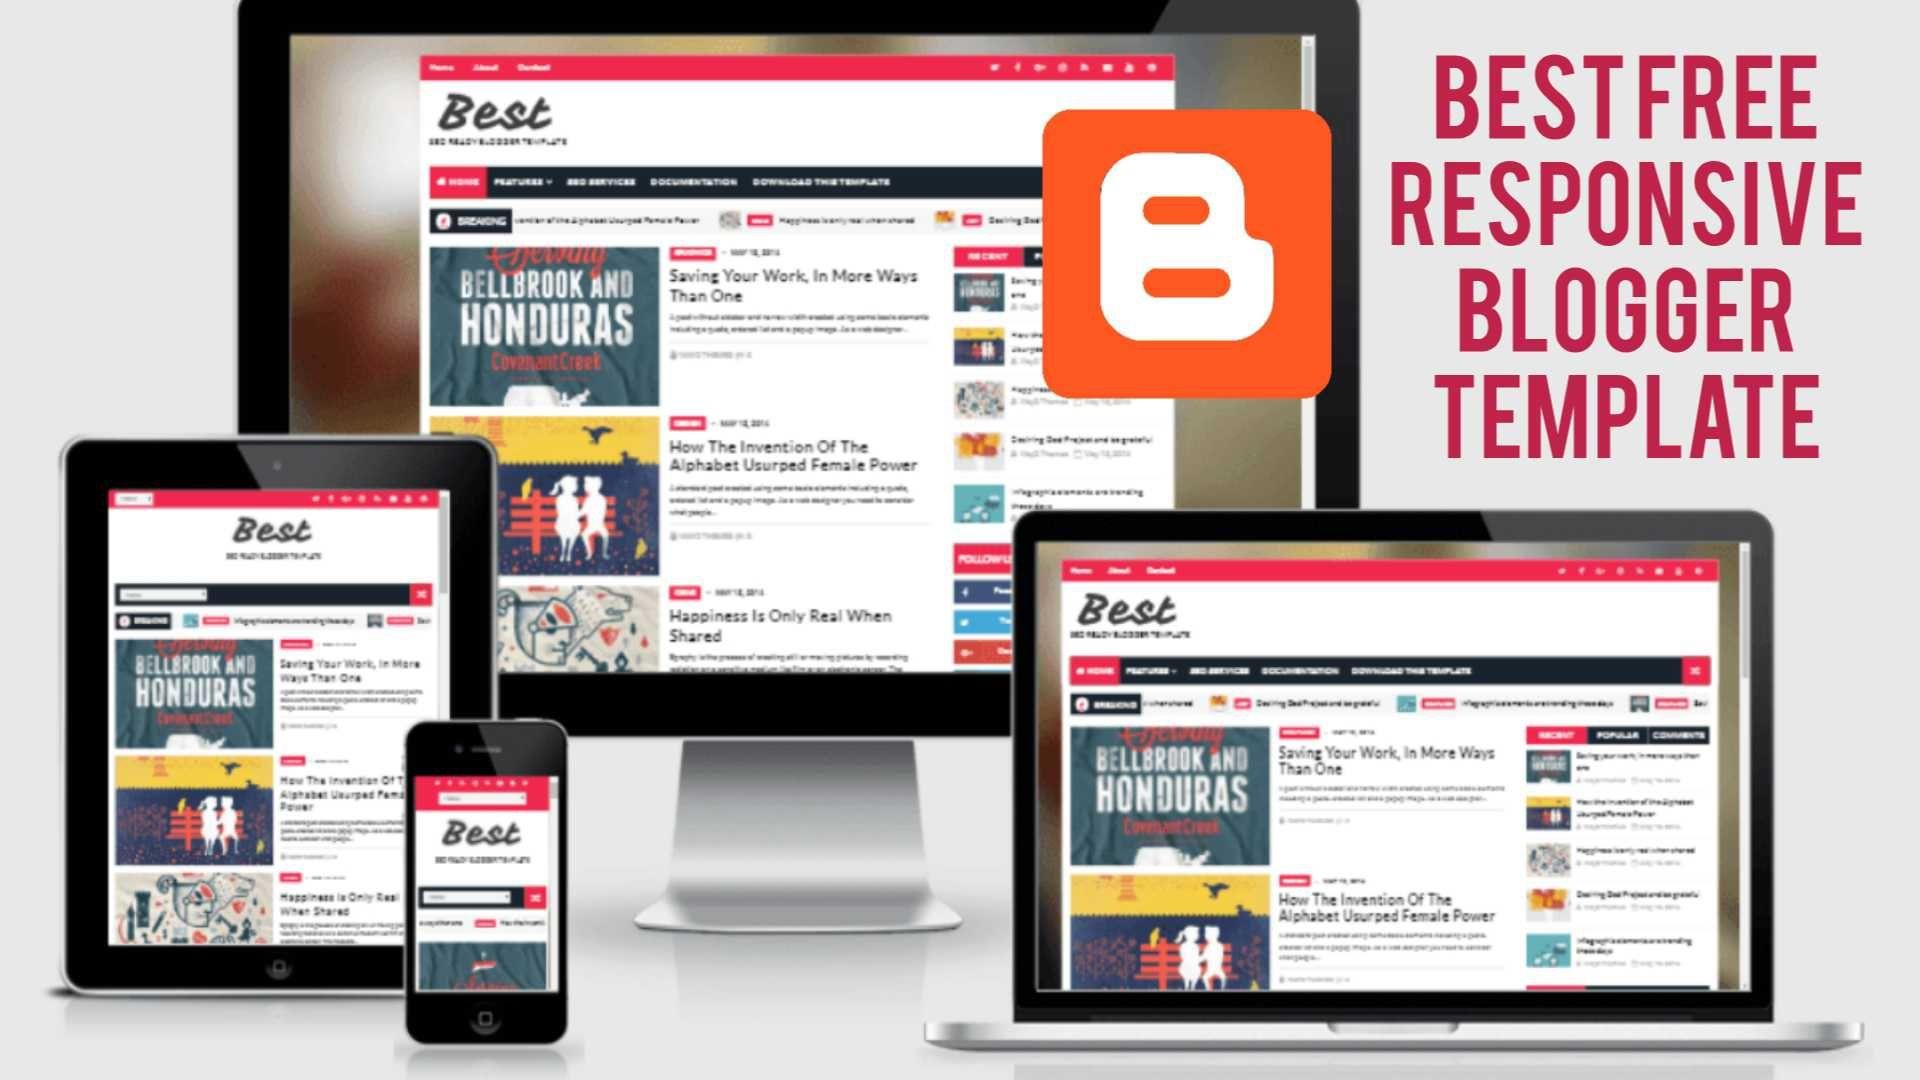 002 Unique Best Free Responsive Blogging Theme Inspiration  Blogger Template 2019 Wordpres Blog DownloadFull